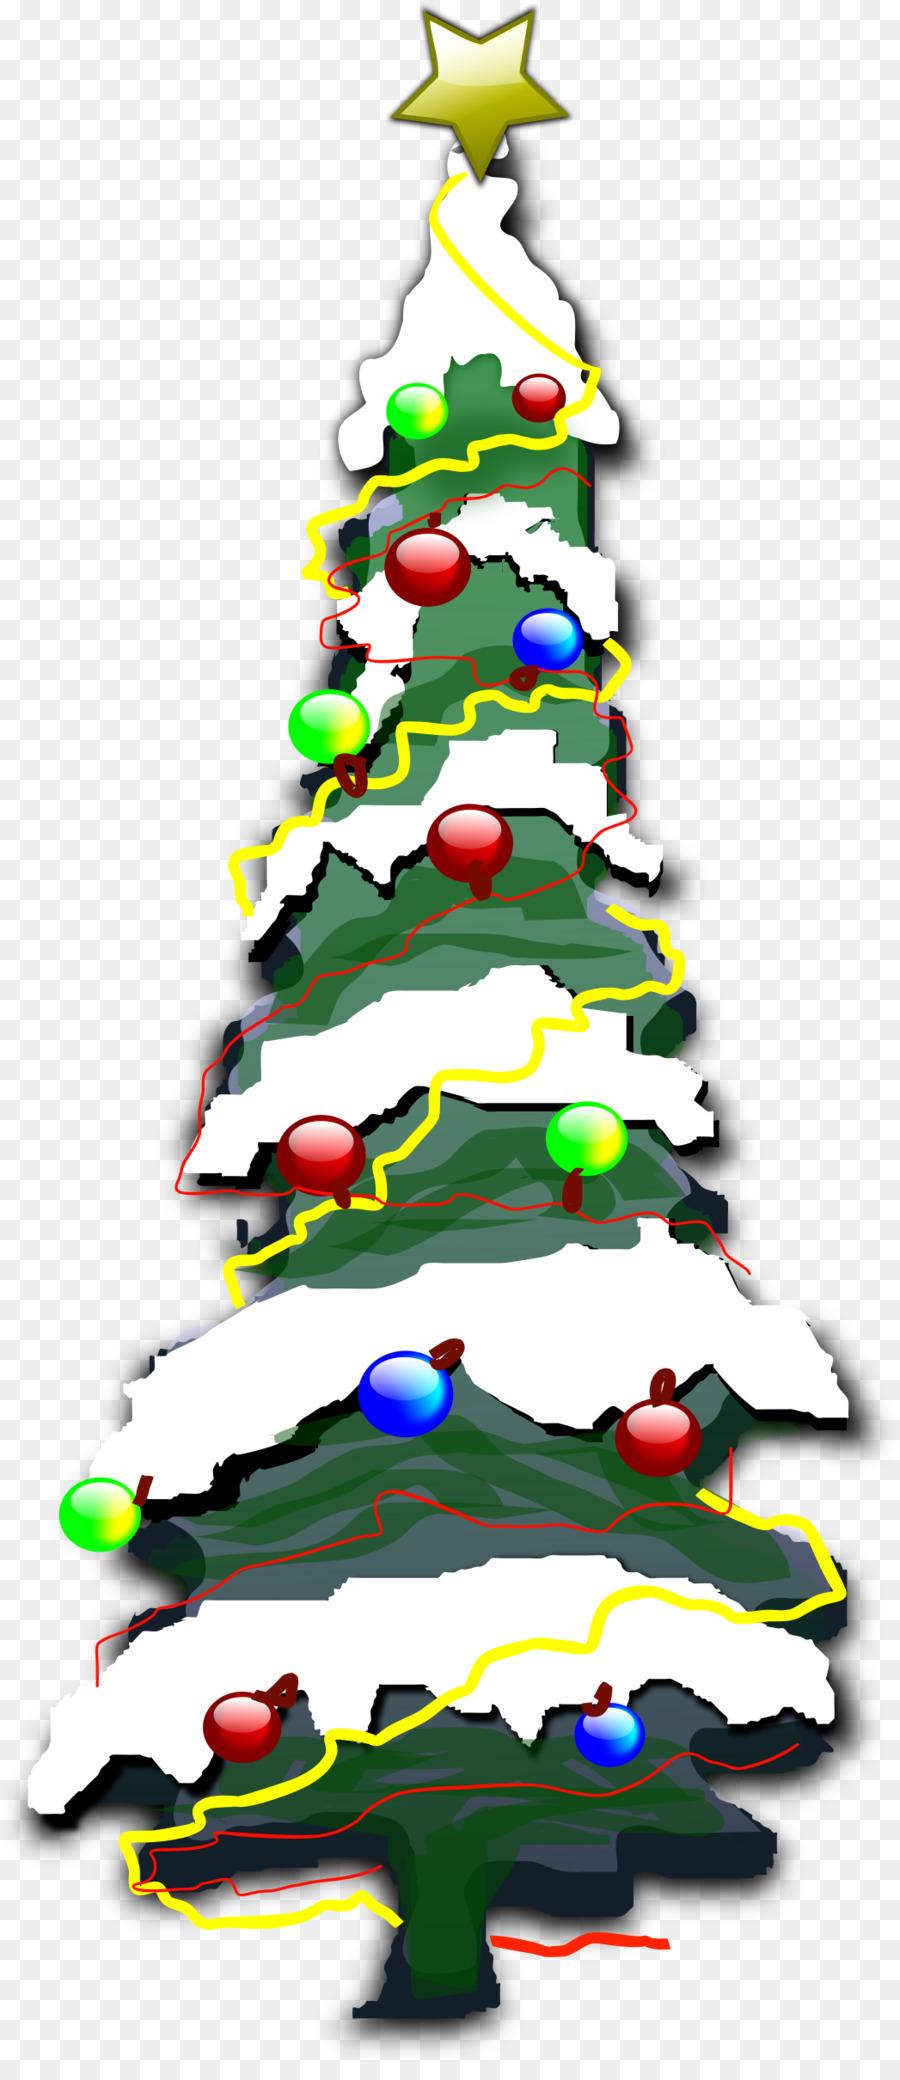 Tall Christmas Tree Clipart.Christmas Tree Illustration Clipart Tree Christmas